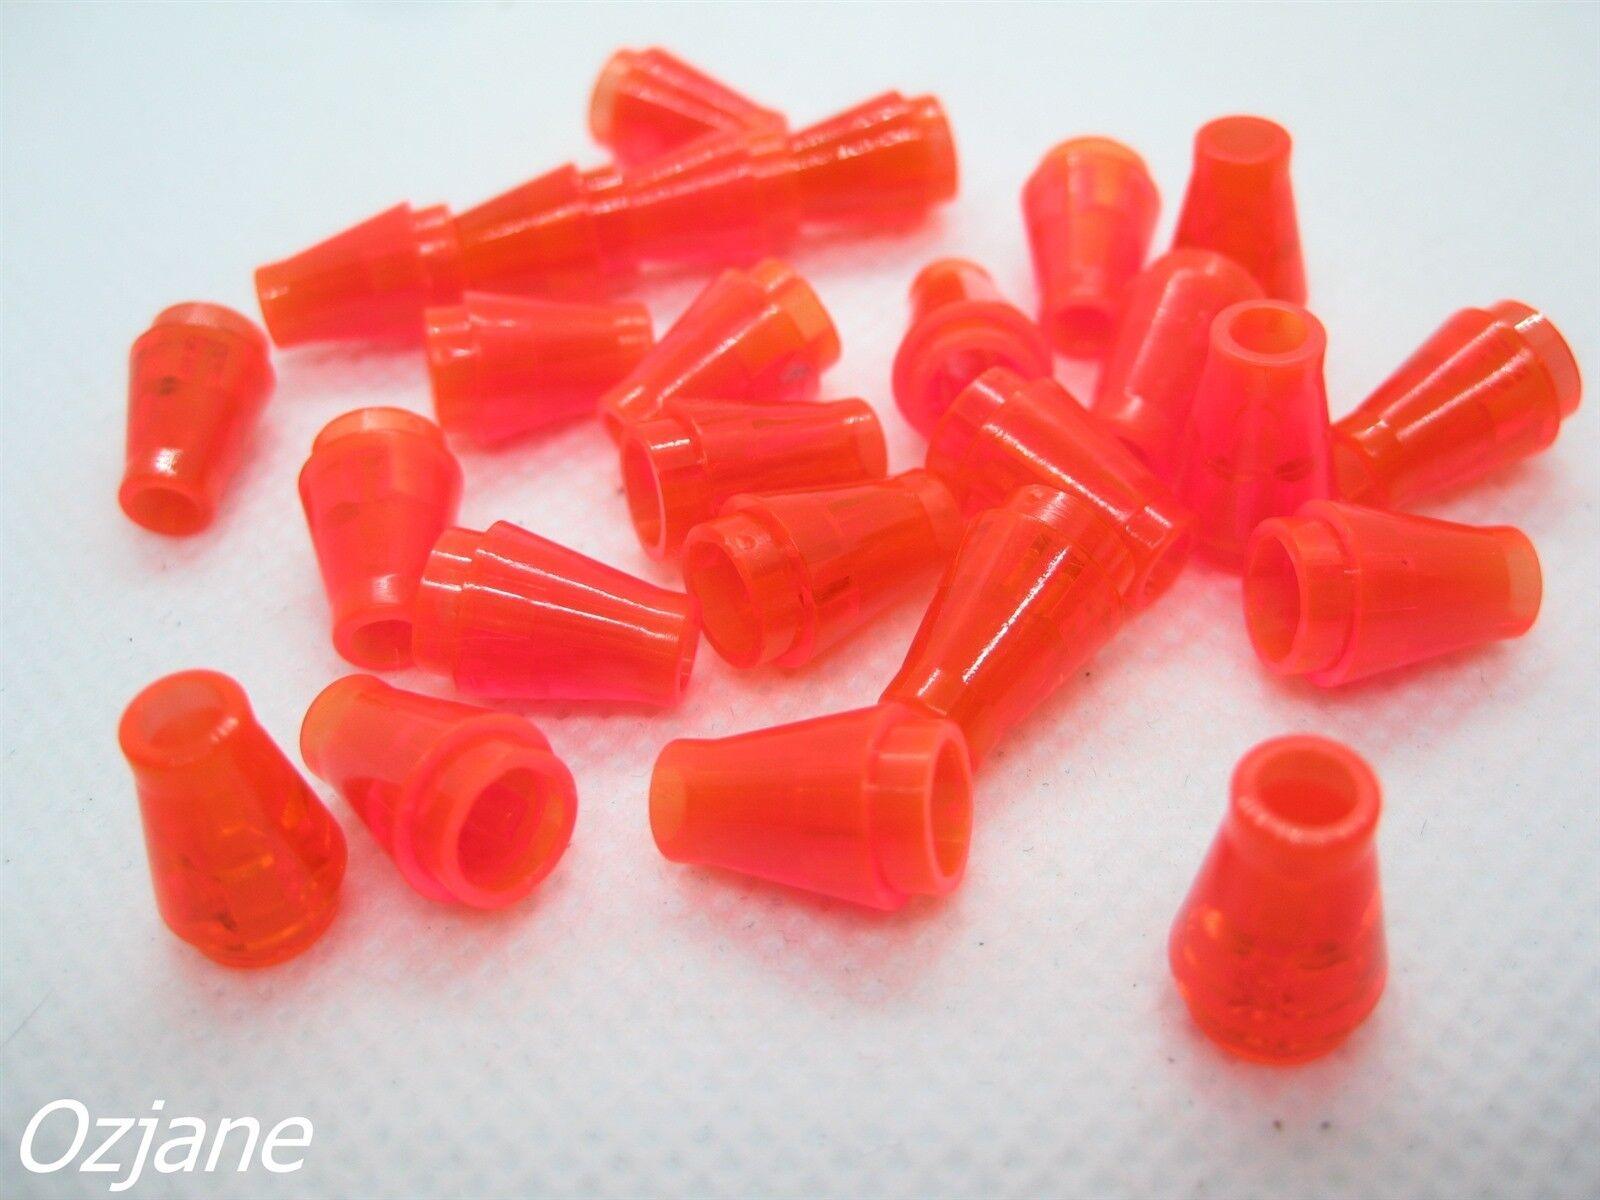 2 X Lego 4589b Cone 1 x 1 with Top Groove Trans-neon orange